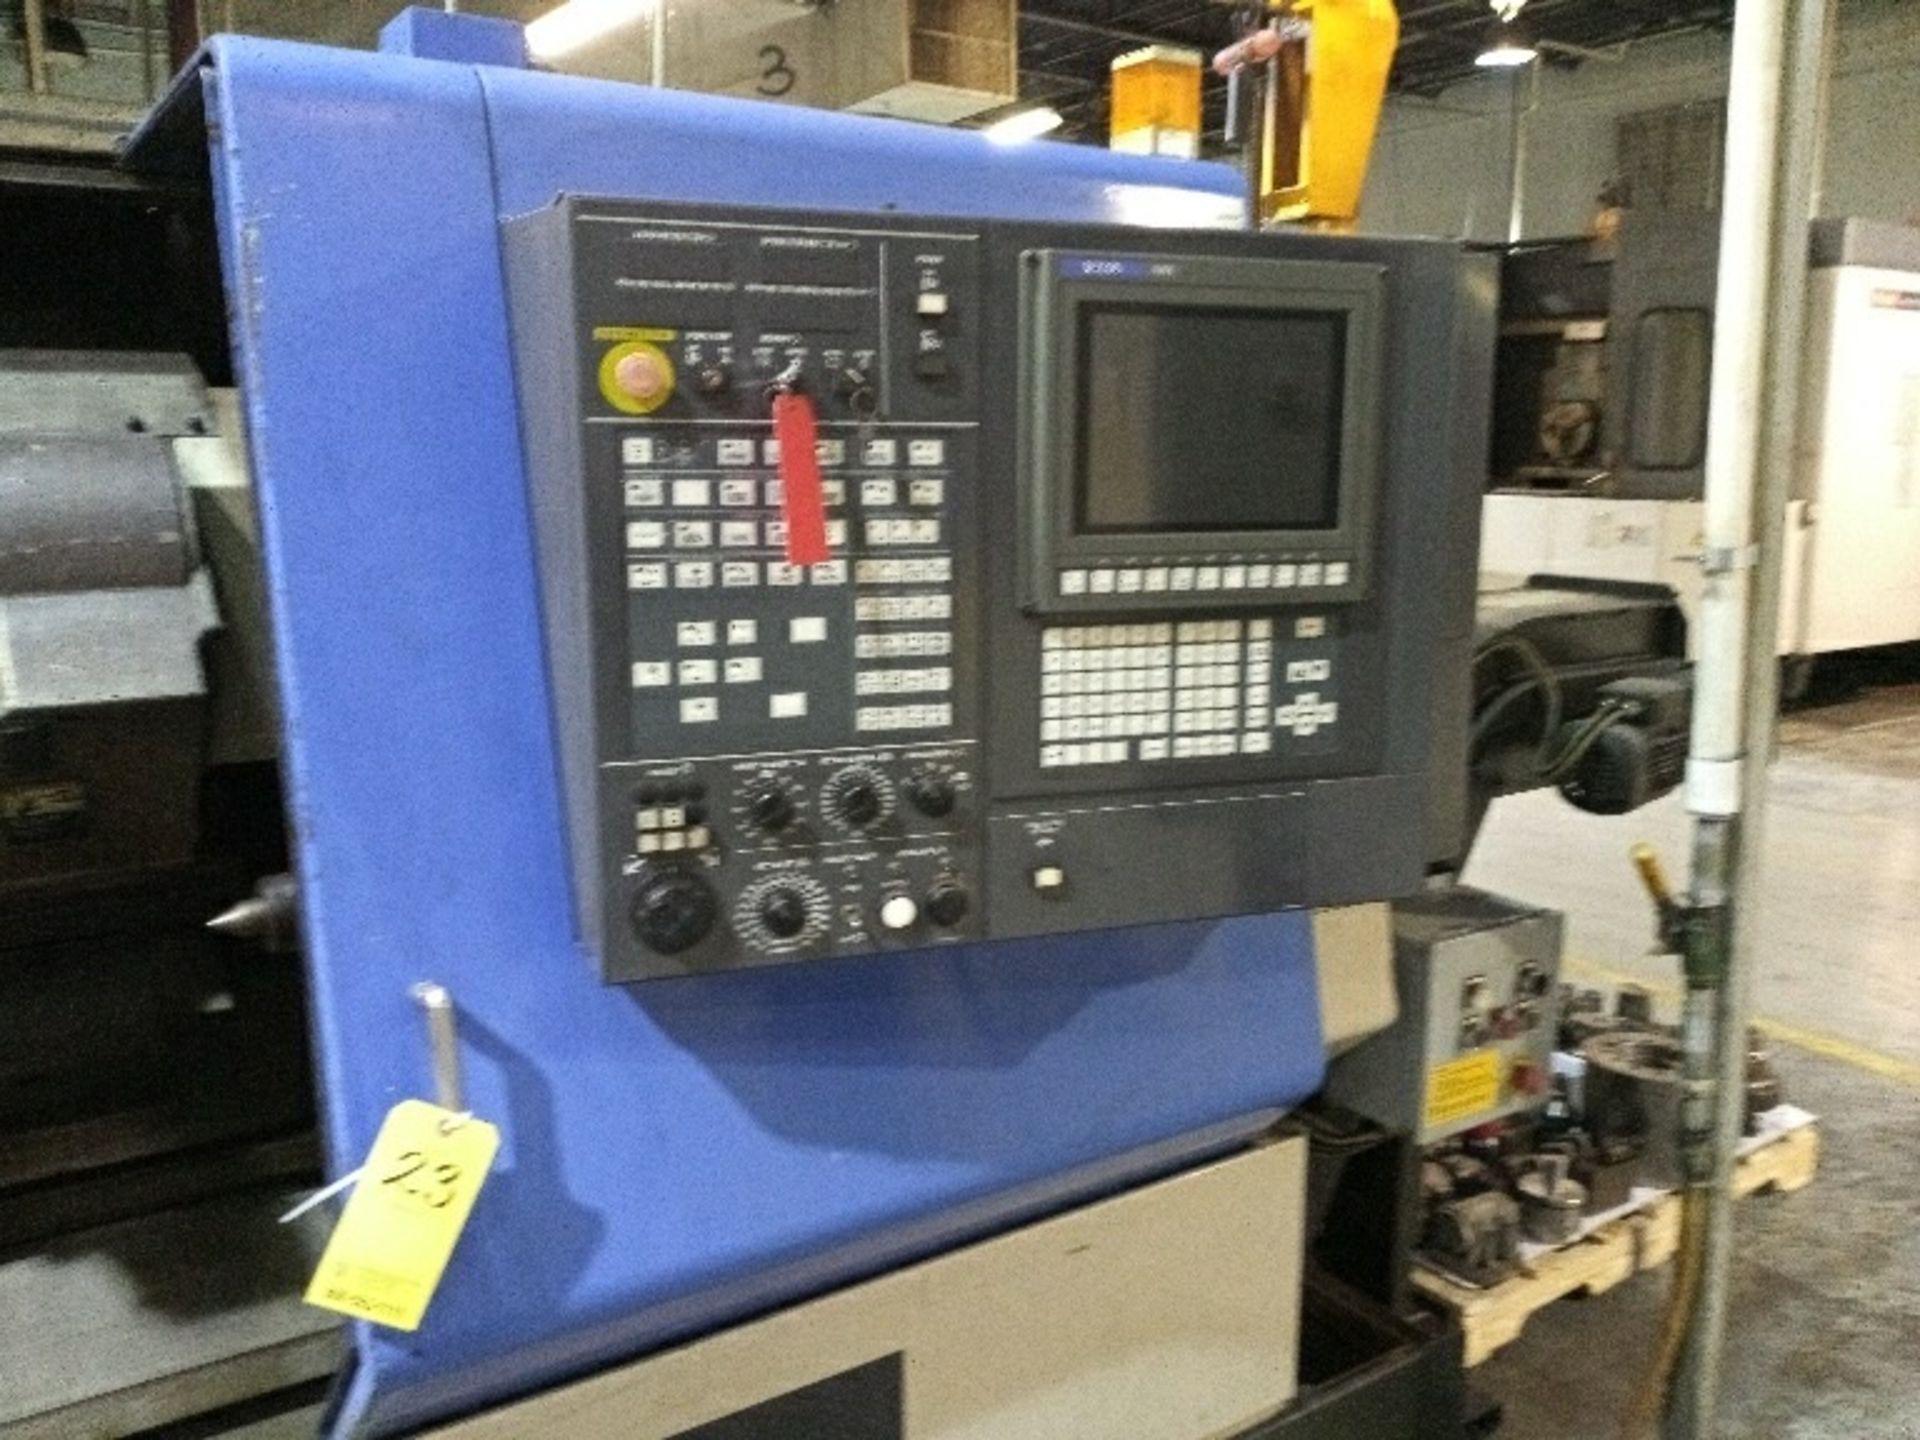 Lot 23 - HITACHI SEIKI HITEC-TURN, 25G, HIGH GRADE CNC TURNING CENTER W/ SEICOS A10L CONTROL W/ TOOLING